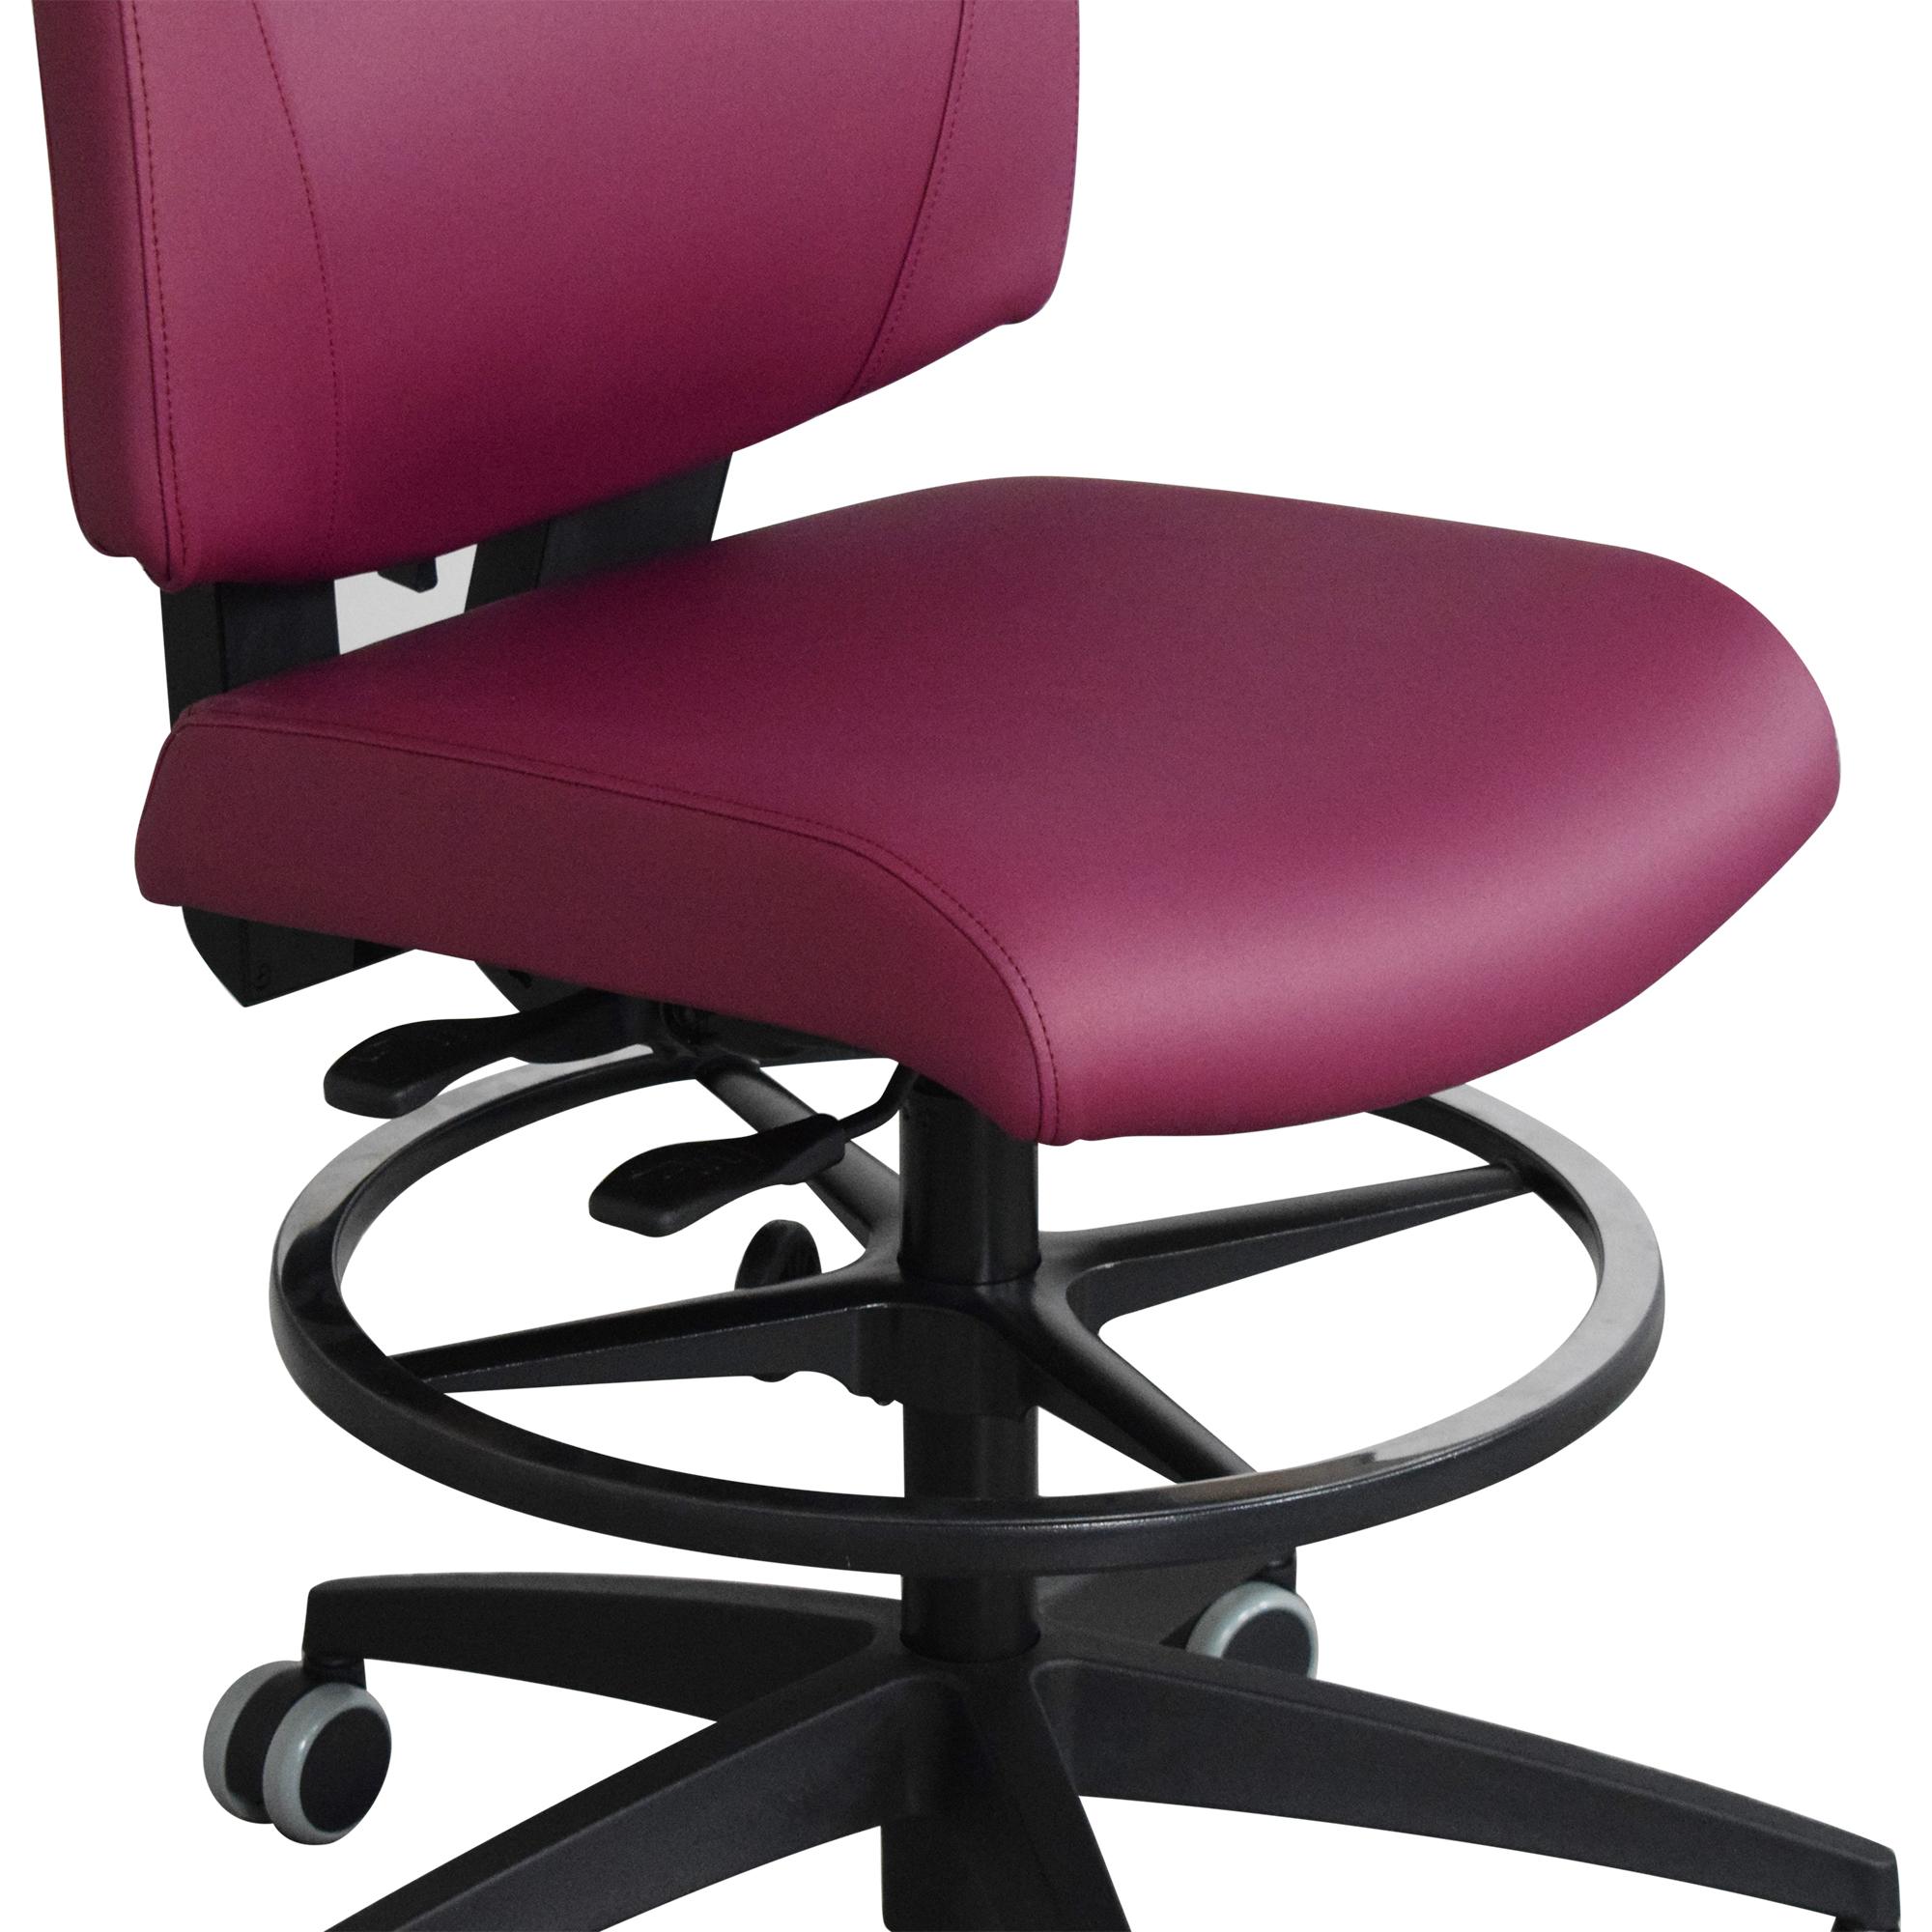 Global Furniture Group Global Furniture Group G1 Ergo Select Drafting Stool coupon